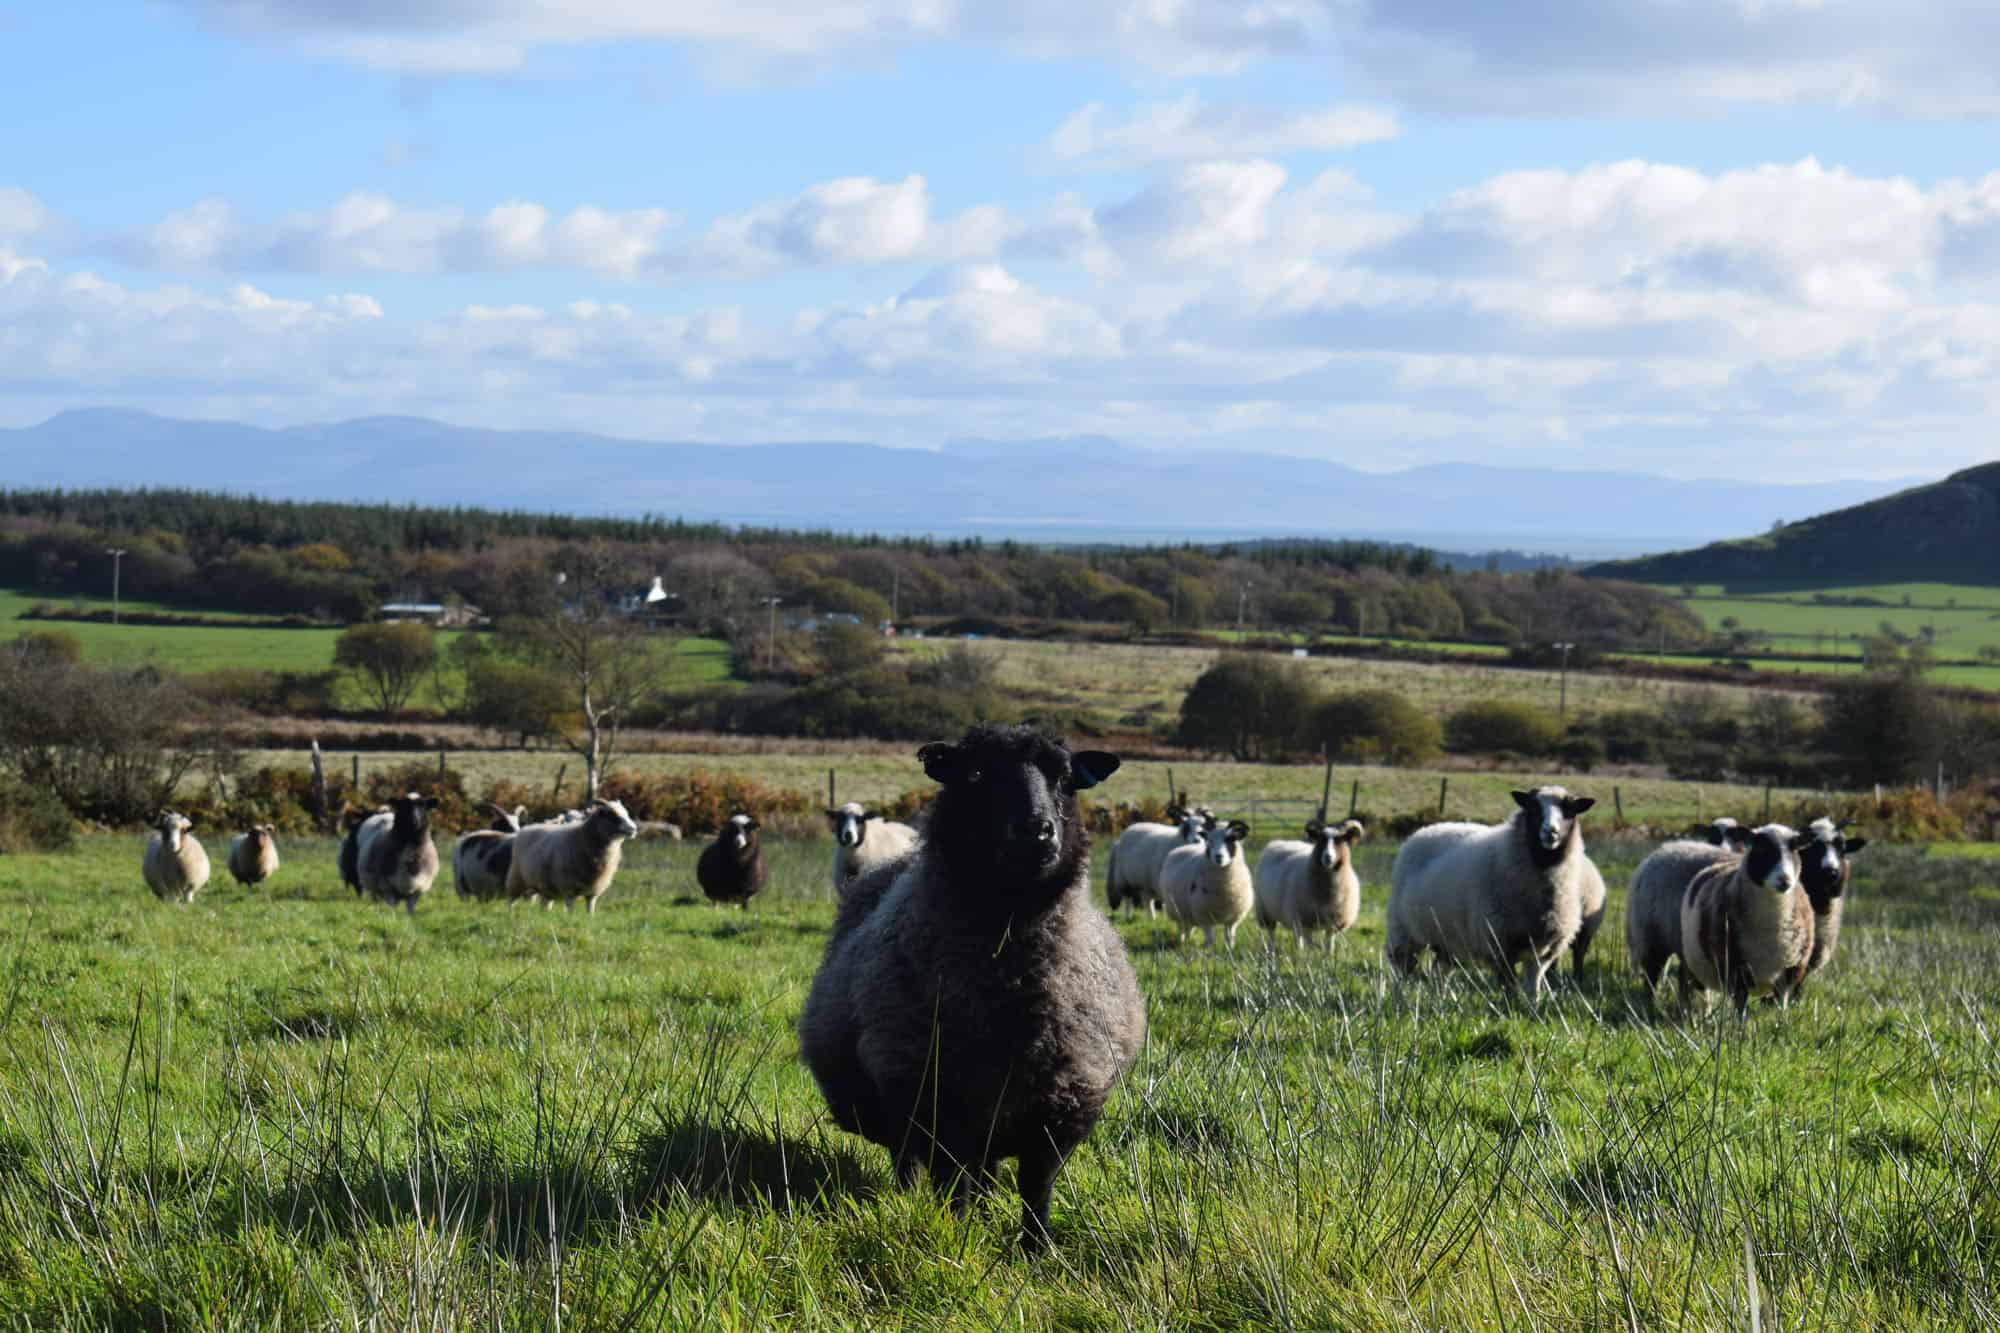 Currant black shetland sheep grandma kind fibre wool crafts leader